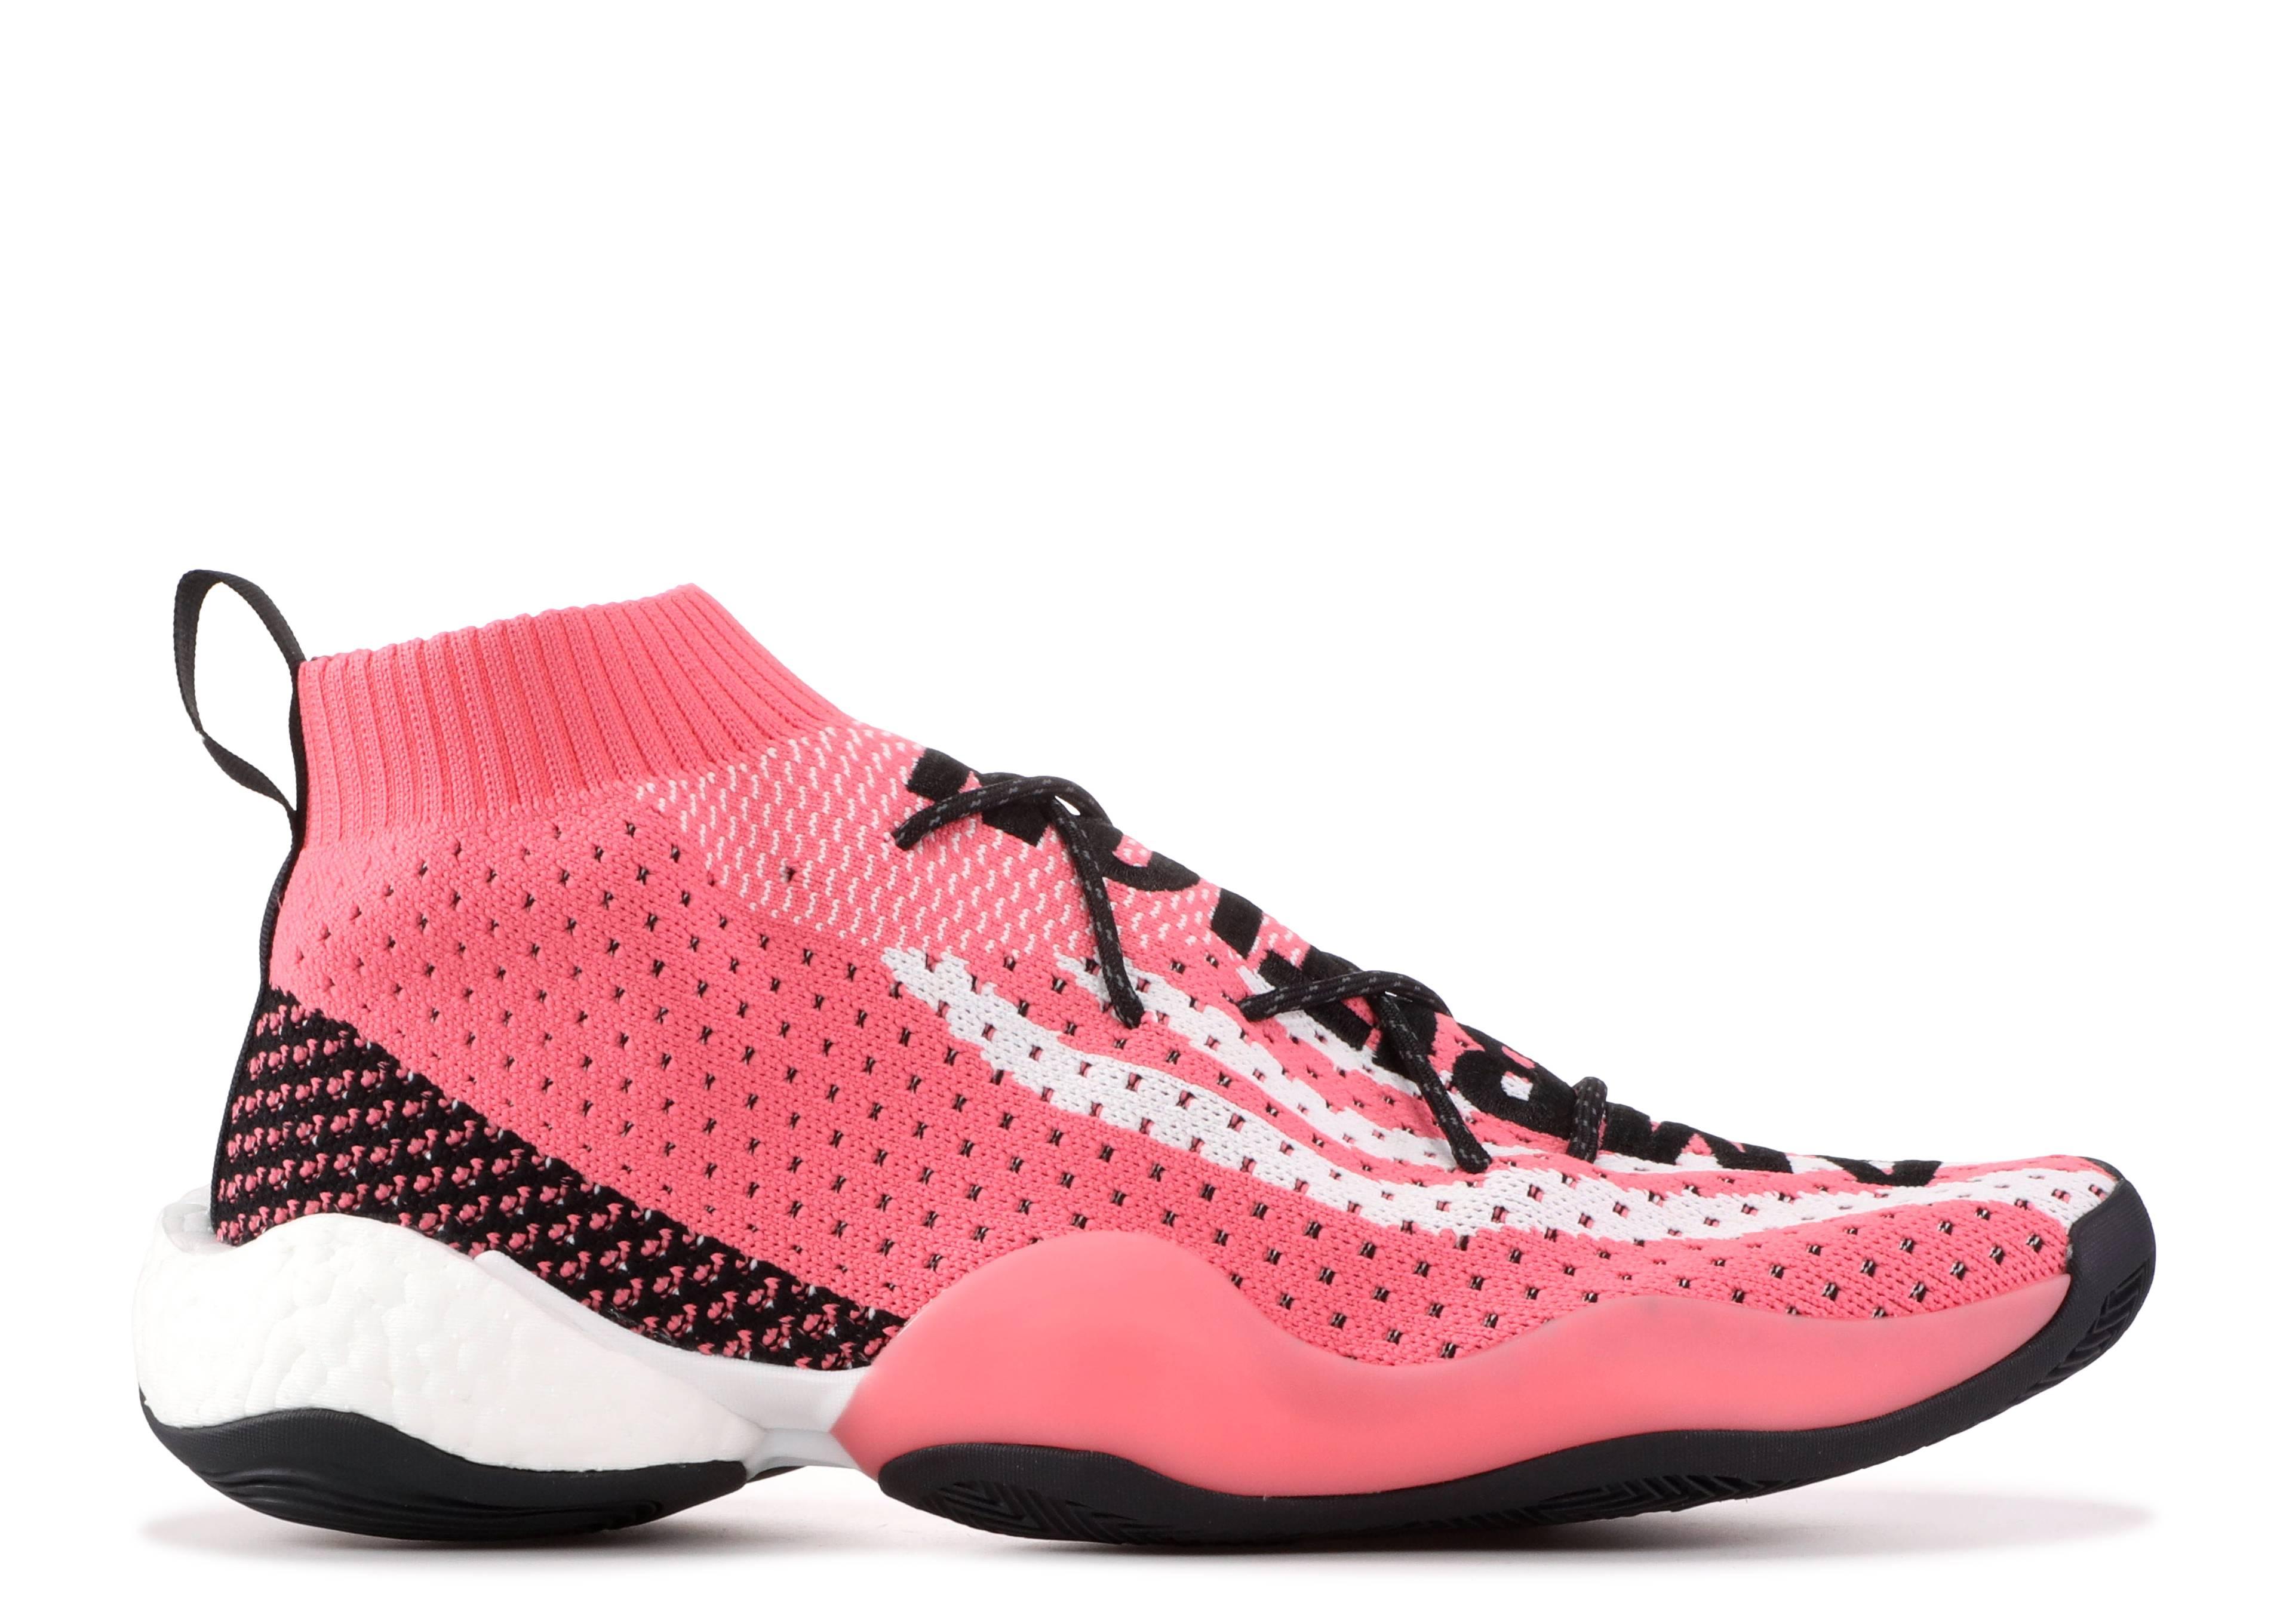 49d8924ca90c9 CRAZY BYW LVL X PW - Adidas - g28183 - chalk pink footwear white ...